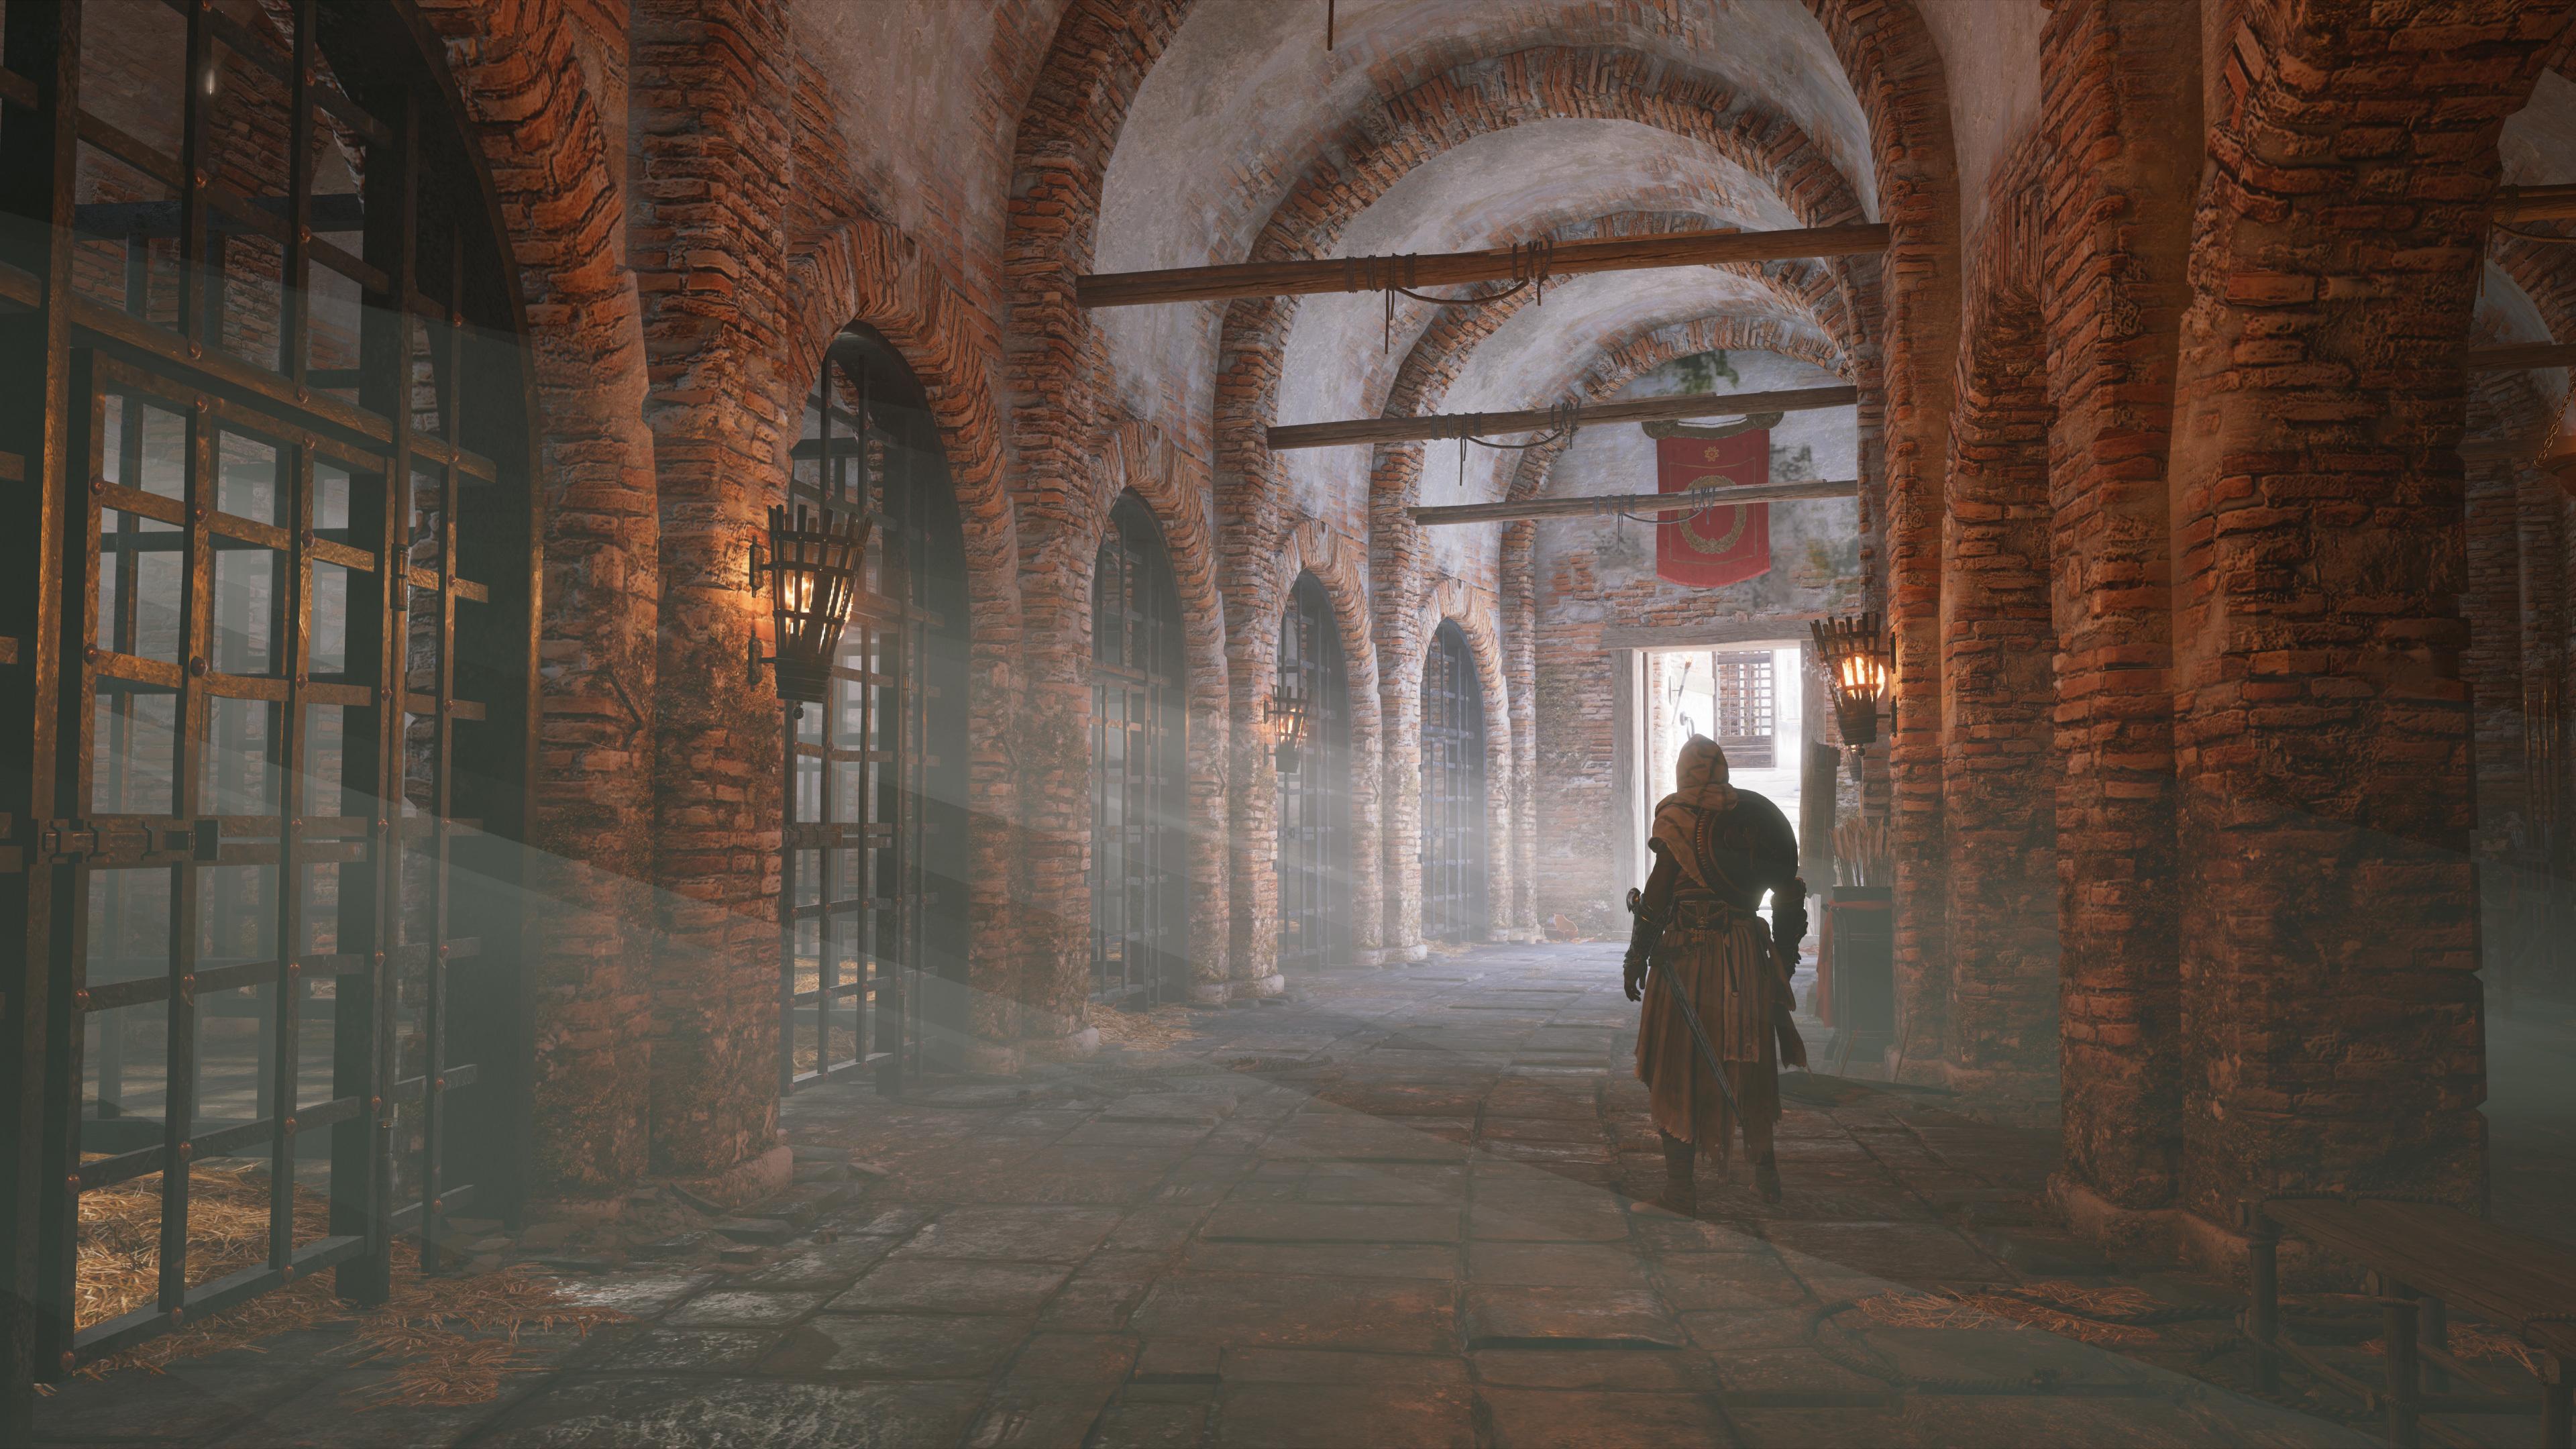 inside castle assassins creed origins 4k 1553074884 - Inside Castle Assassins Creed Origins 4k - xbox games wallpapers, ps games wallpapers, pc games wallpapers, hd-wallpapers, games wallpapers, assassins creed wallpapers, assassins creed origins wallpapers, 5k wallpapers, 4k-wallpapers